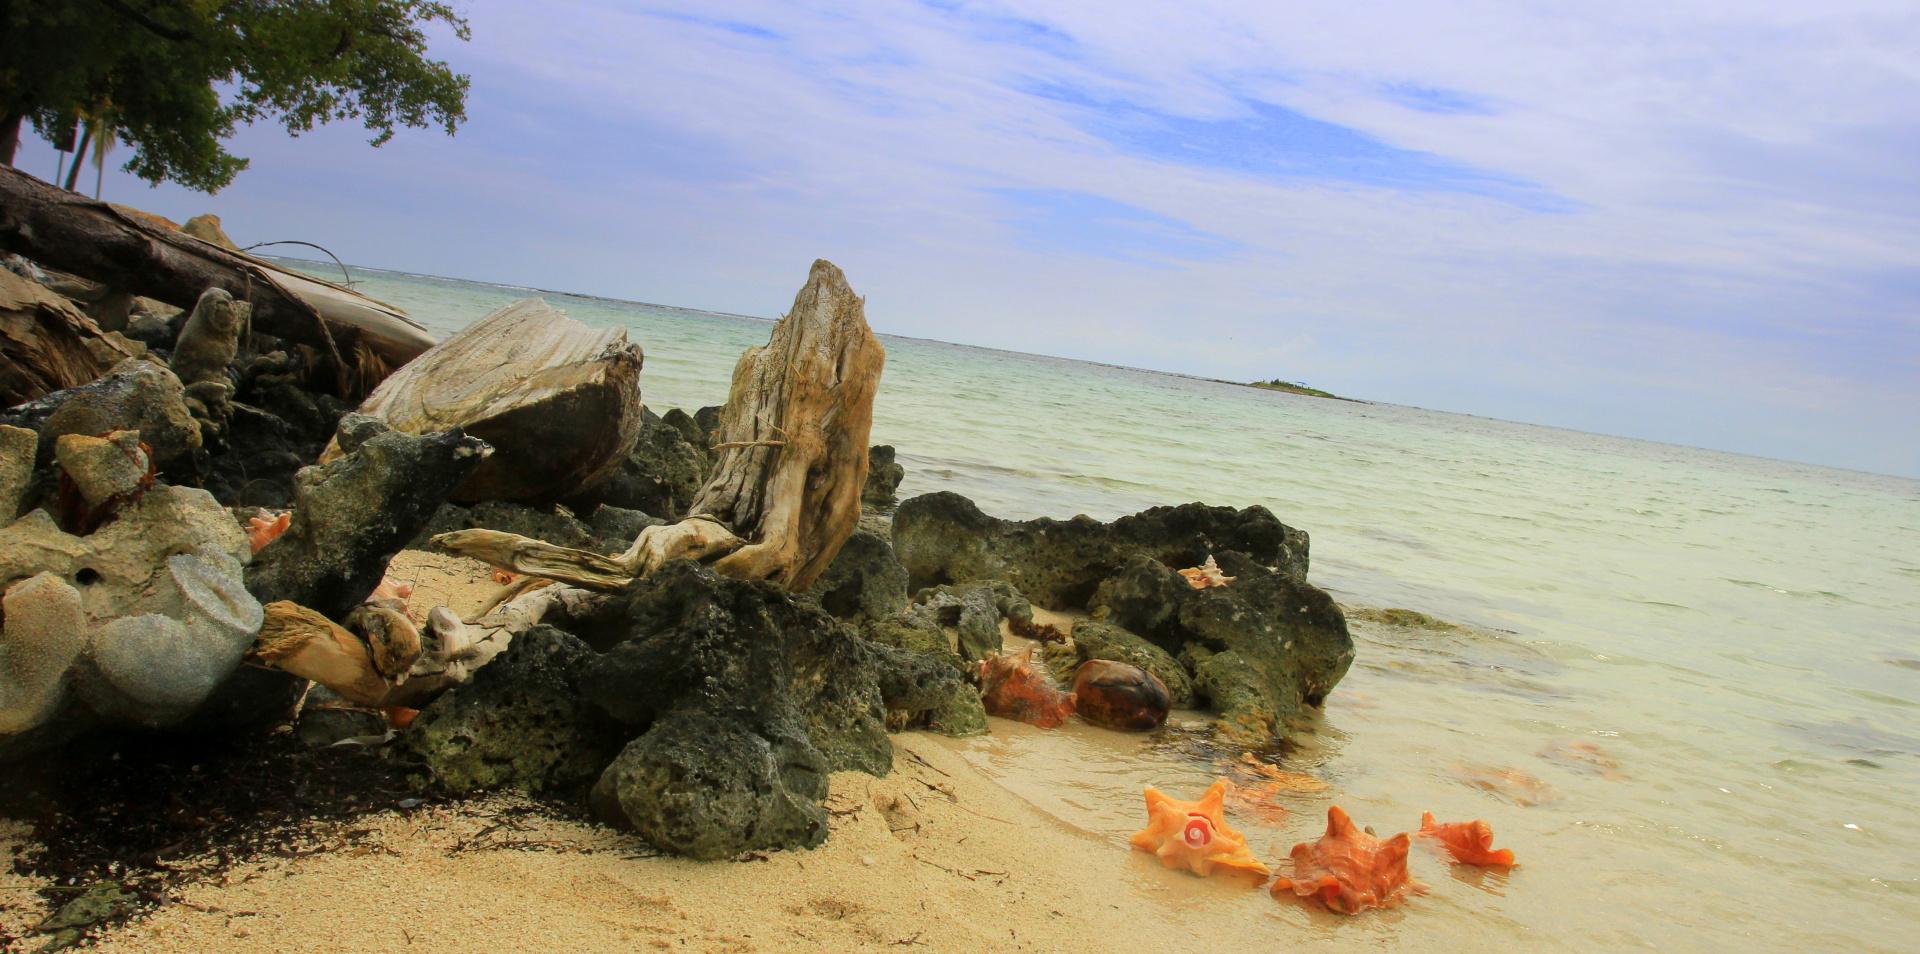 South Water Caye